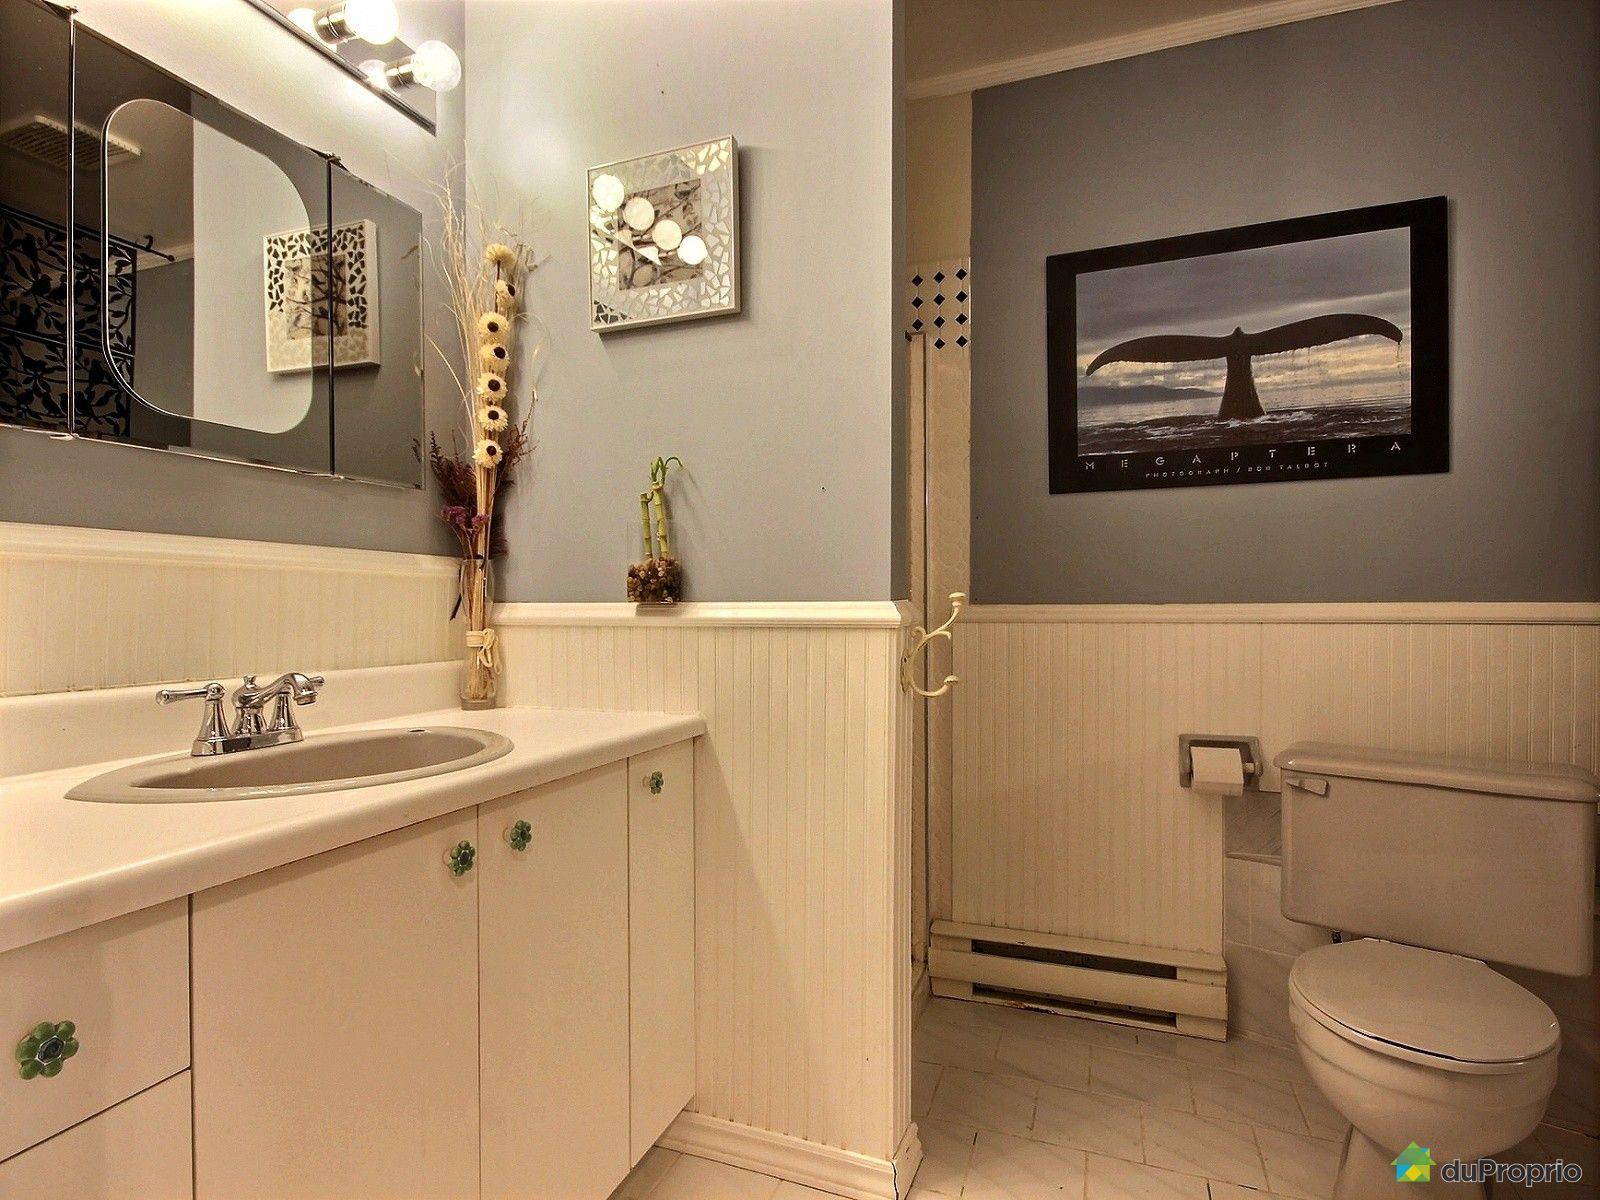 Maison vendre montr al 1520 avenue marcel faribault for Reno salle de bain quebec